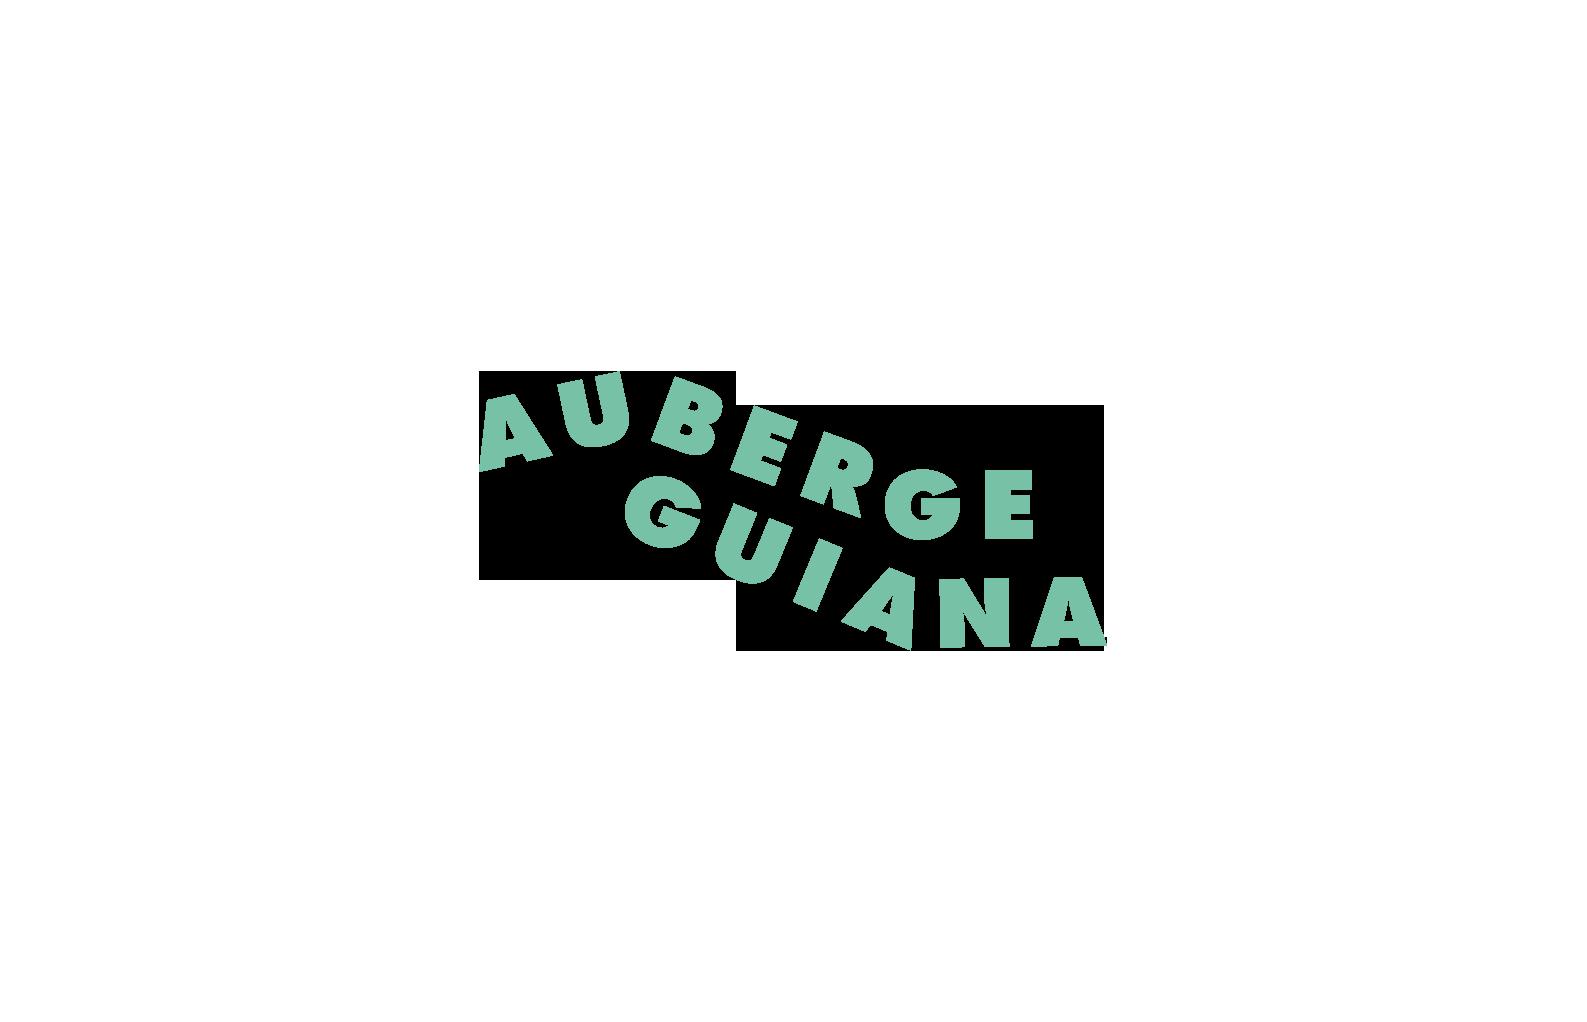 home-french auberge guiana